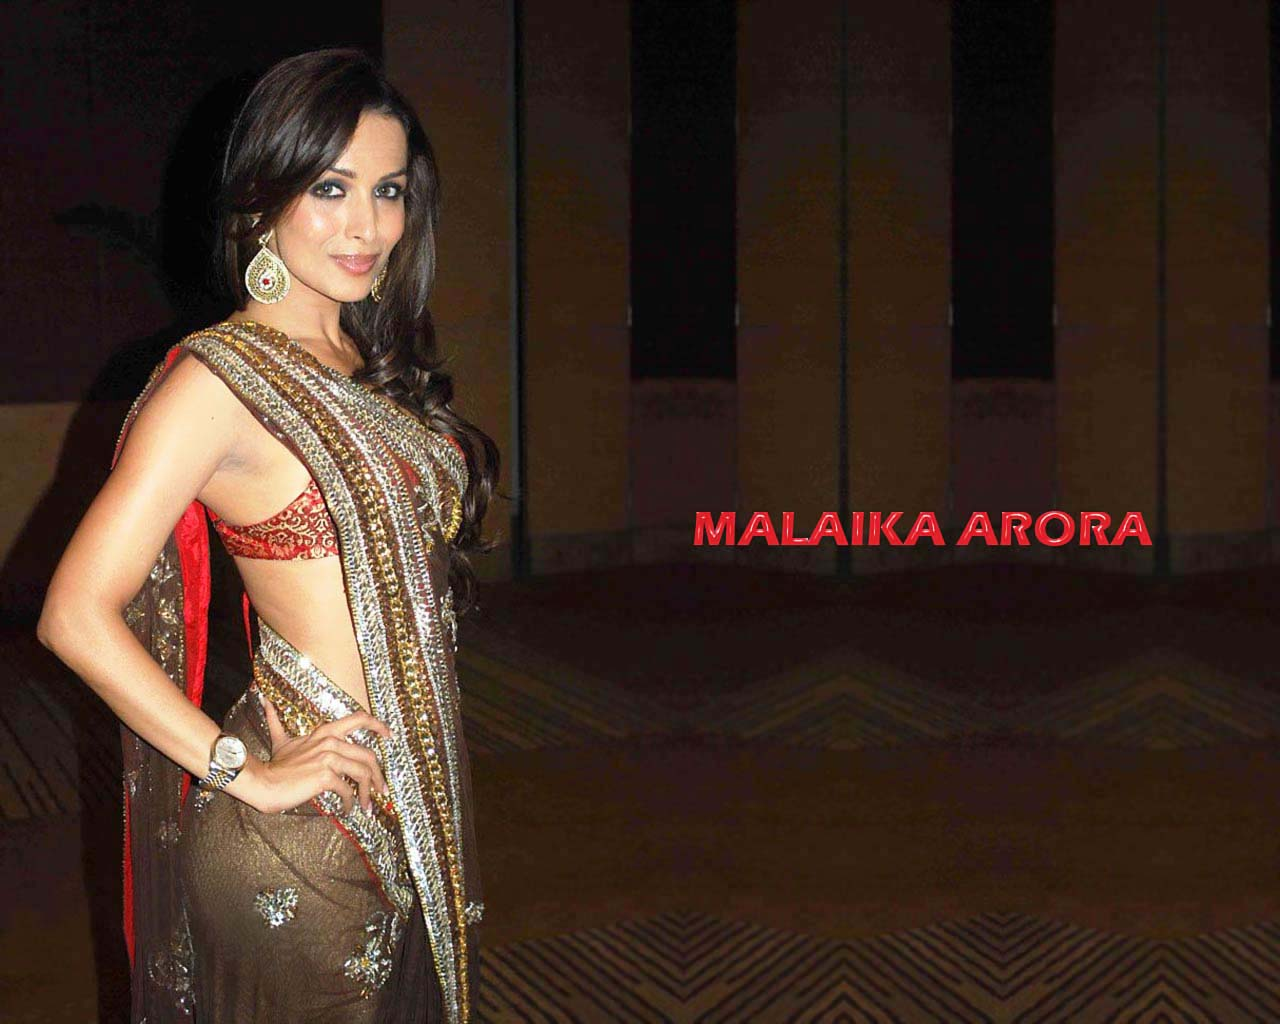 Hot Malaika Arora Bikini Wall Papers  Naked Xxx Pictures Collection-6176